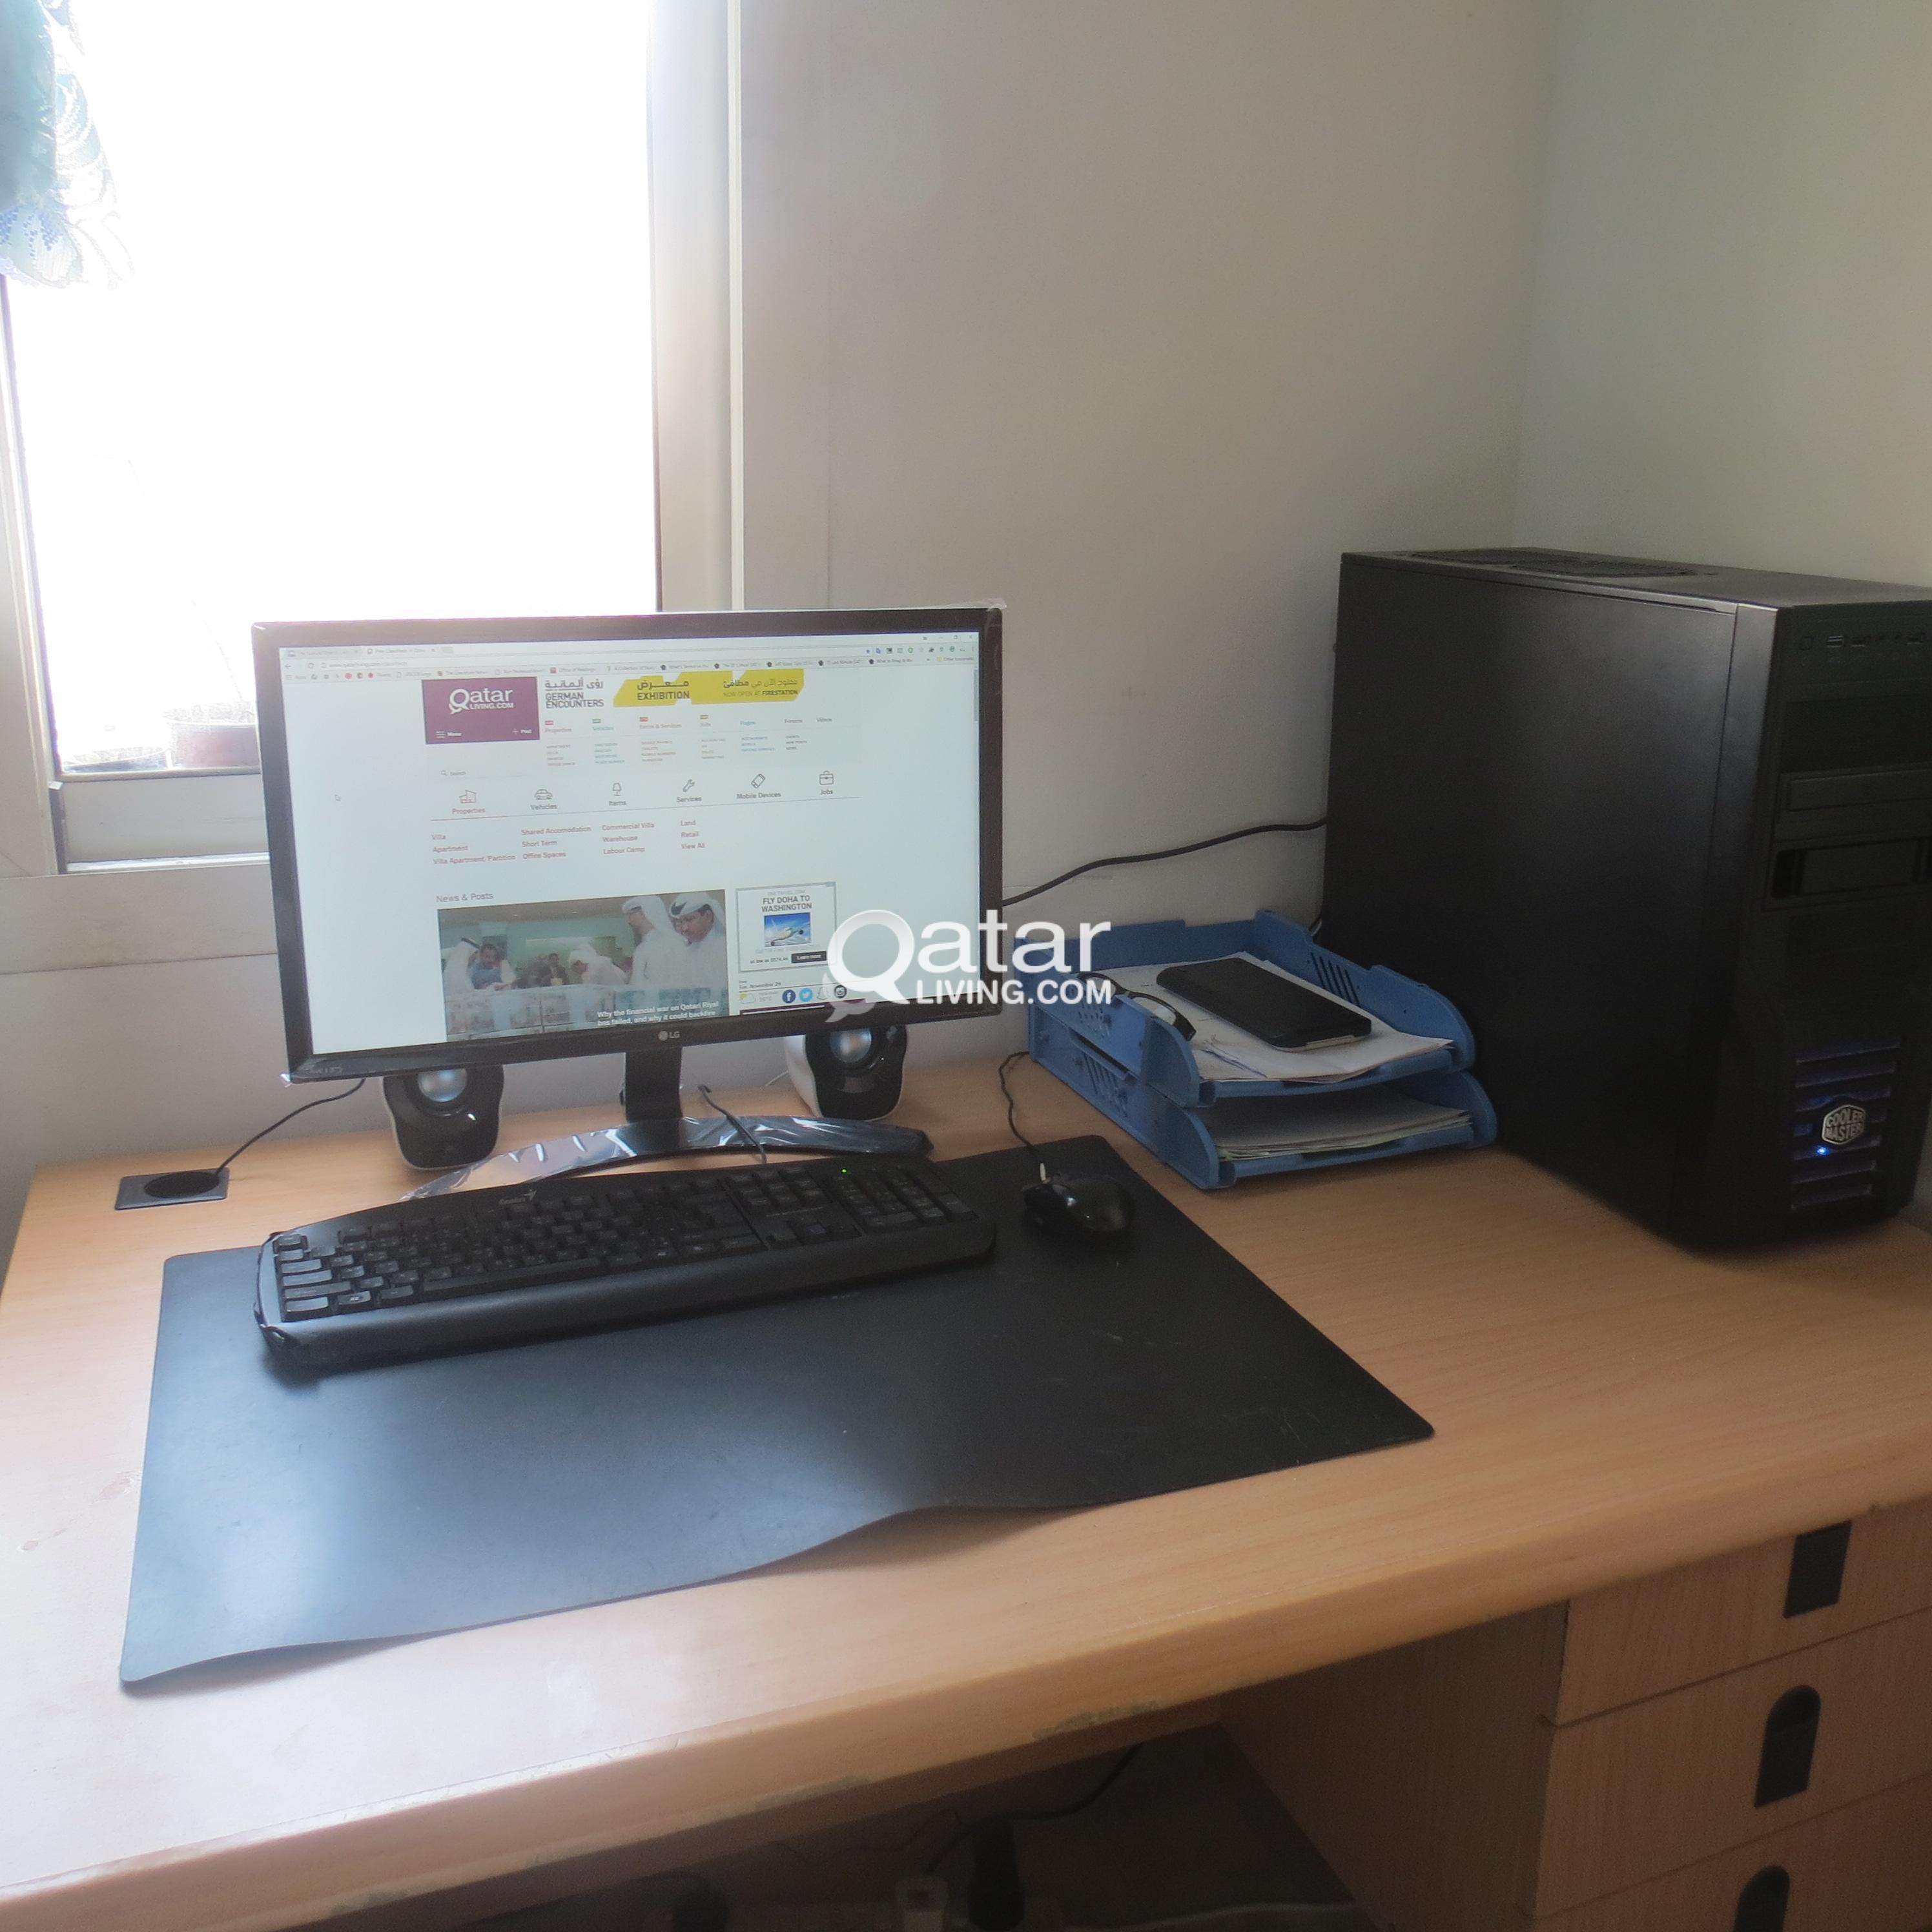 i5 4460 GTX 95 Custom Desktop PC with LG monitor and Razer